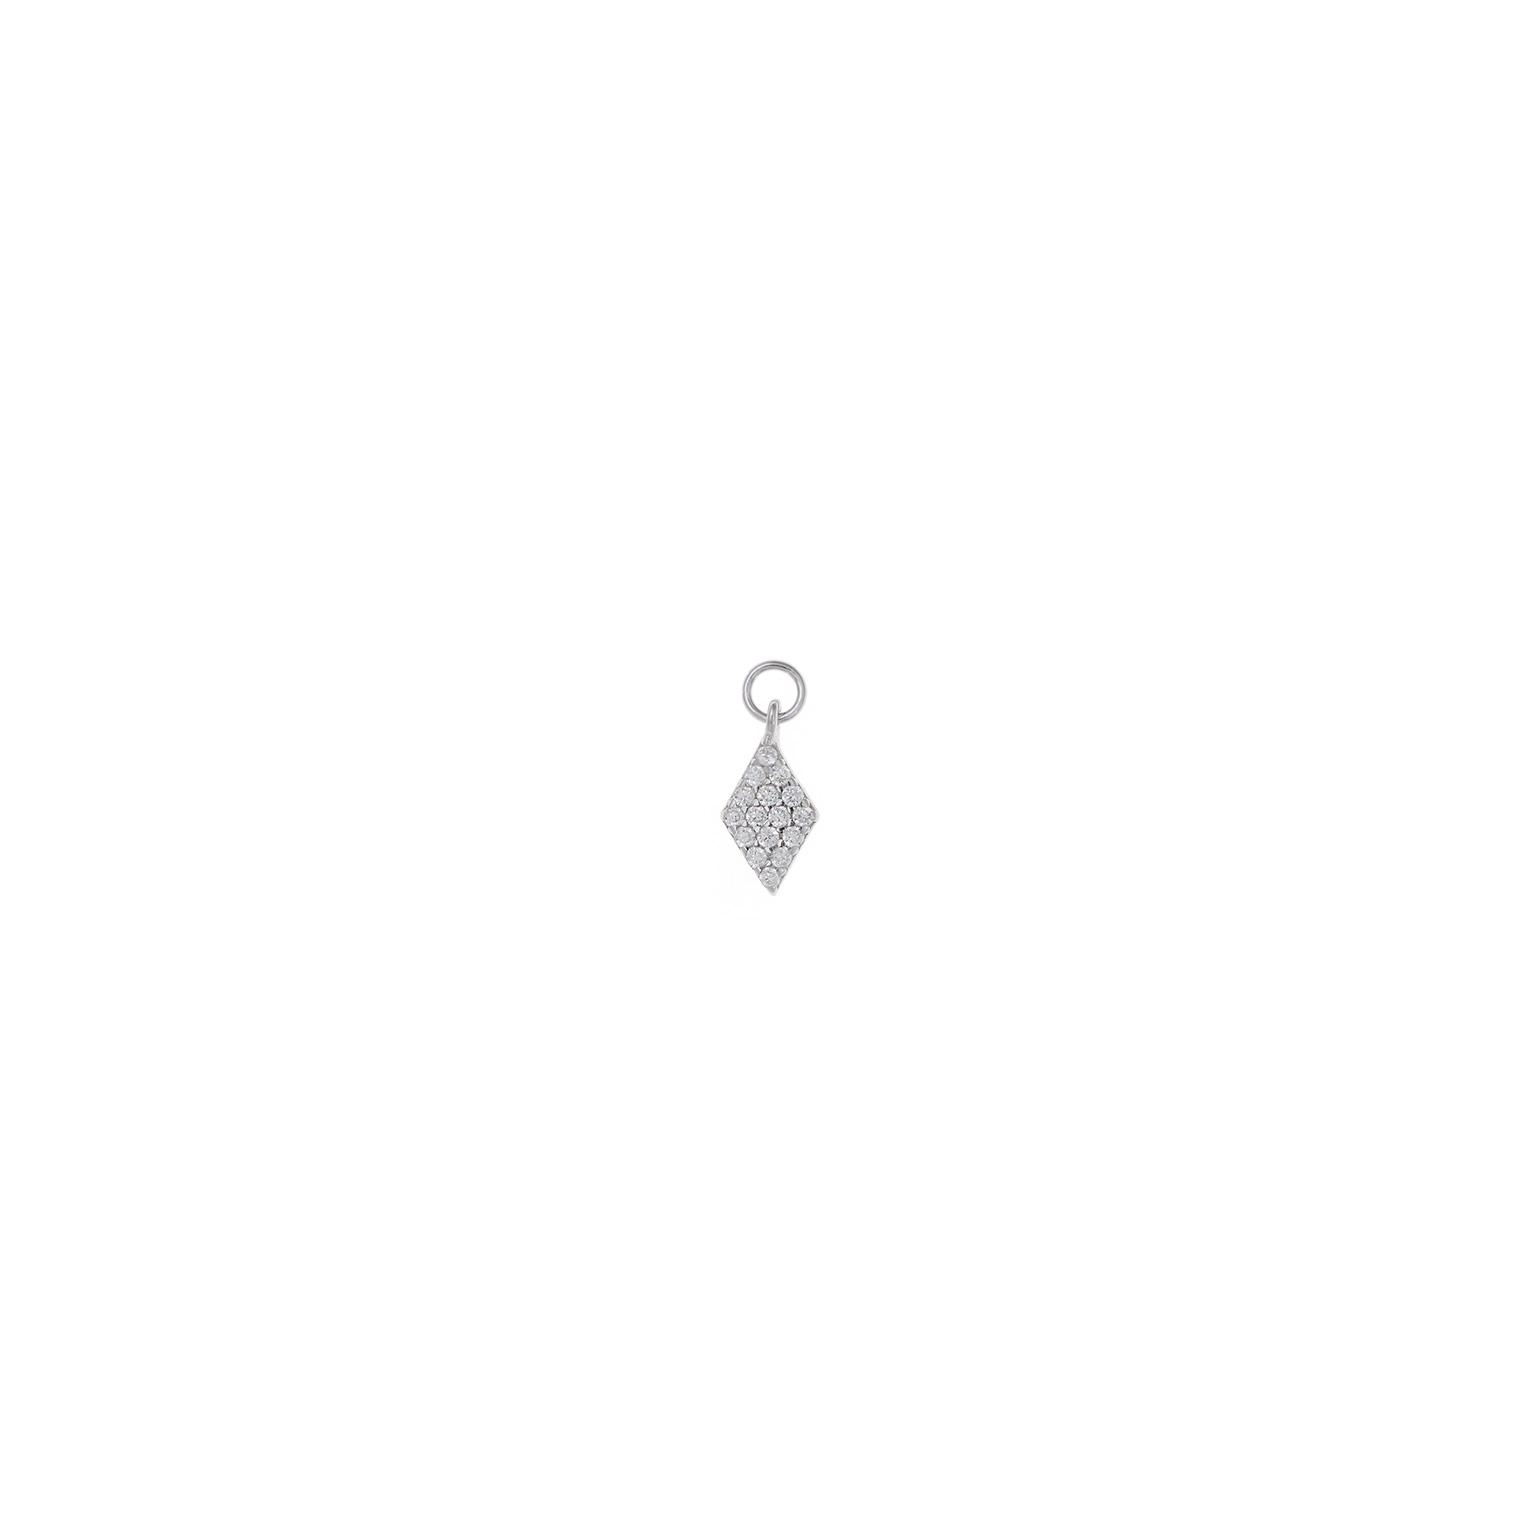 Charm  plata Salvatore rombo con circonitas blancas